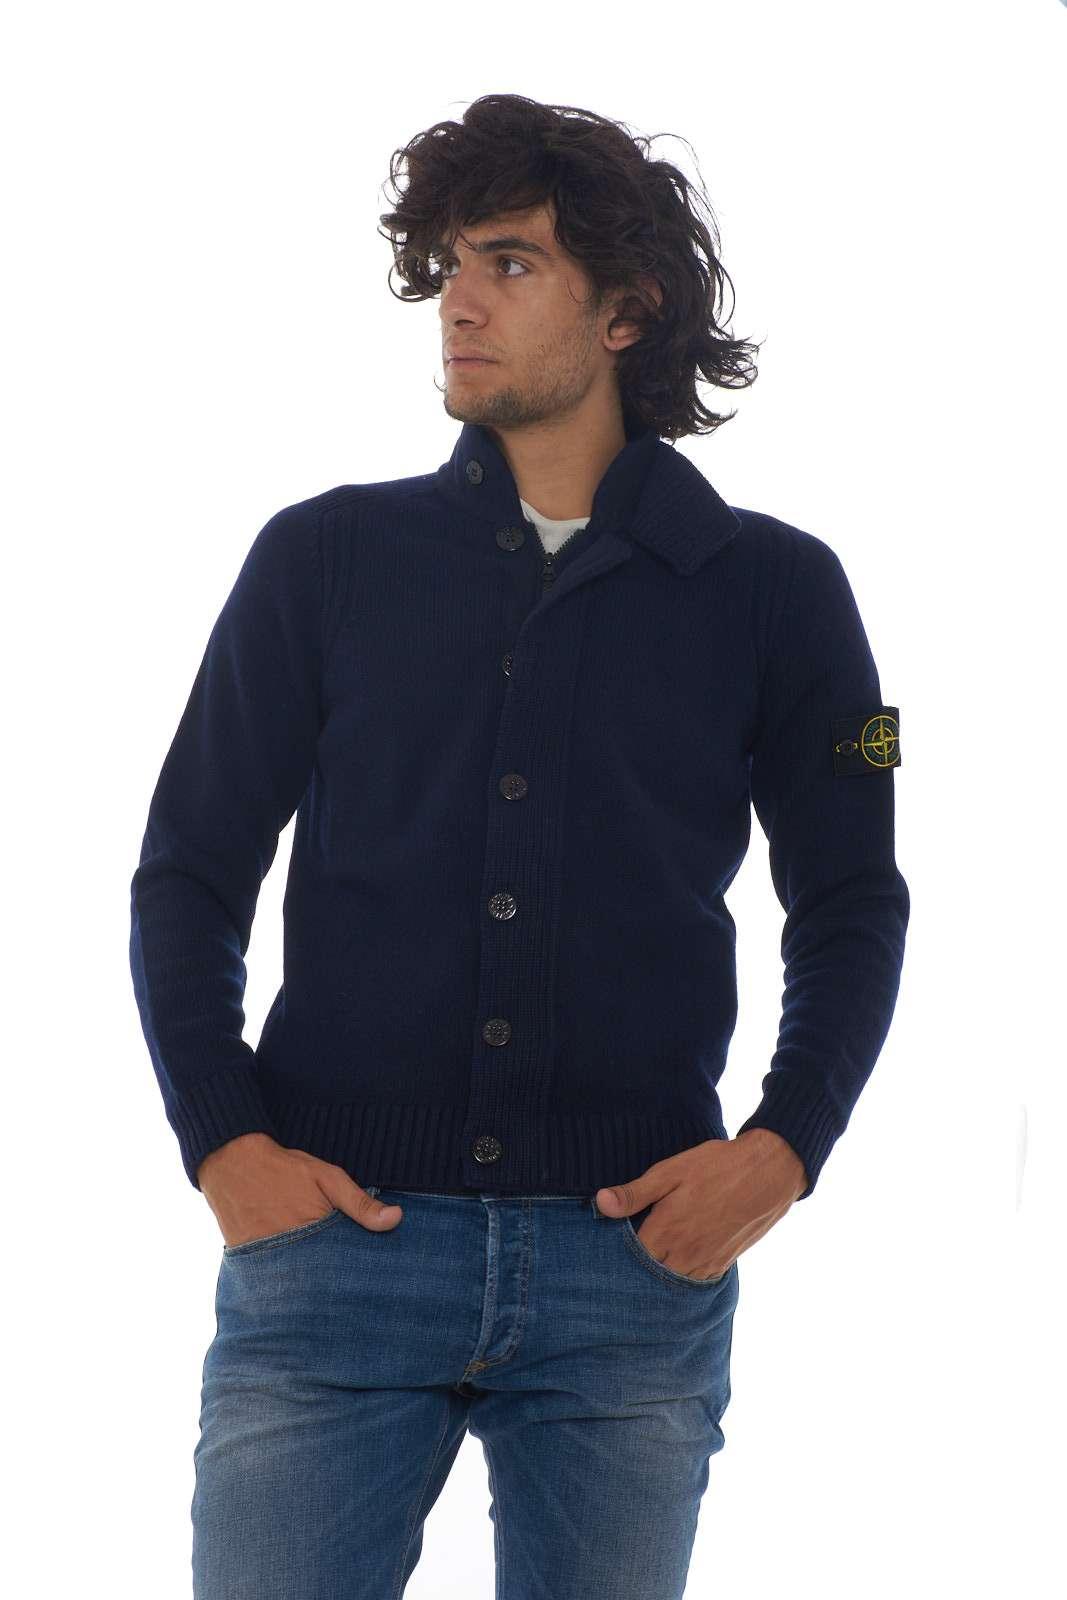 https://www.parmax.com/media/catalog/product/a/i/AI-outlet_parmax-cardigan-uomo-Stone-Island-7115564A3-A.jpg